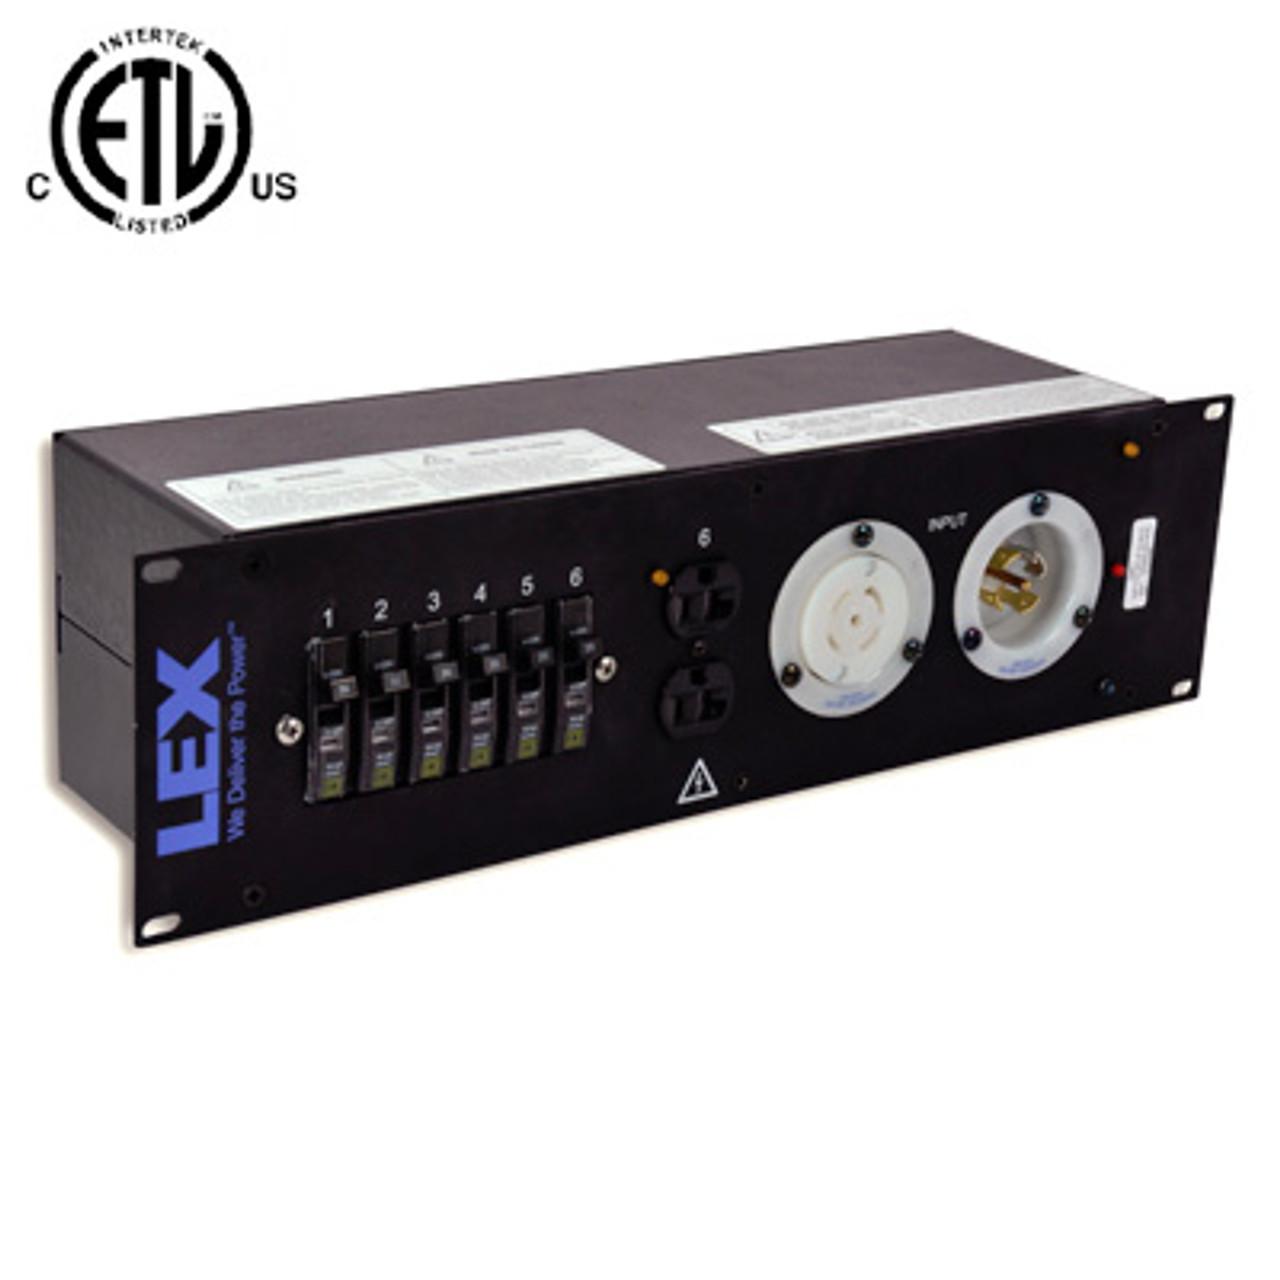 lex 2ru rack mount power distribution l21 30 in thru to 4 l5 30 and duplexes